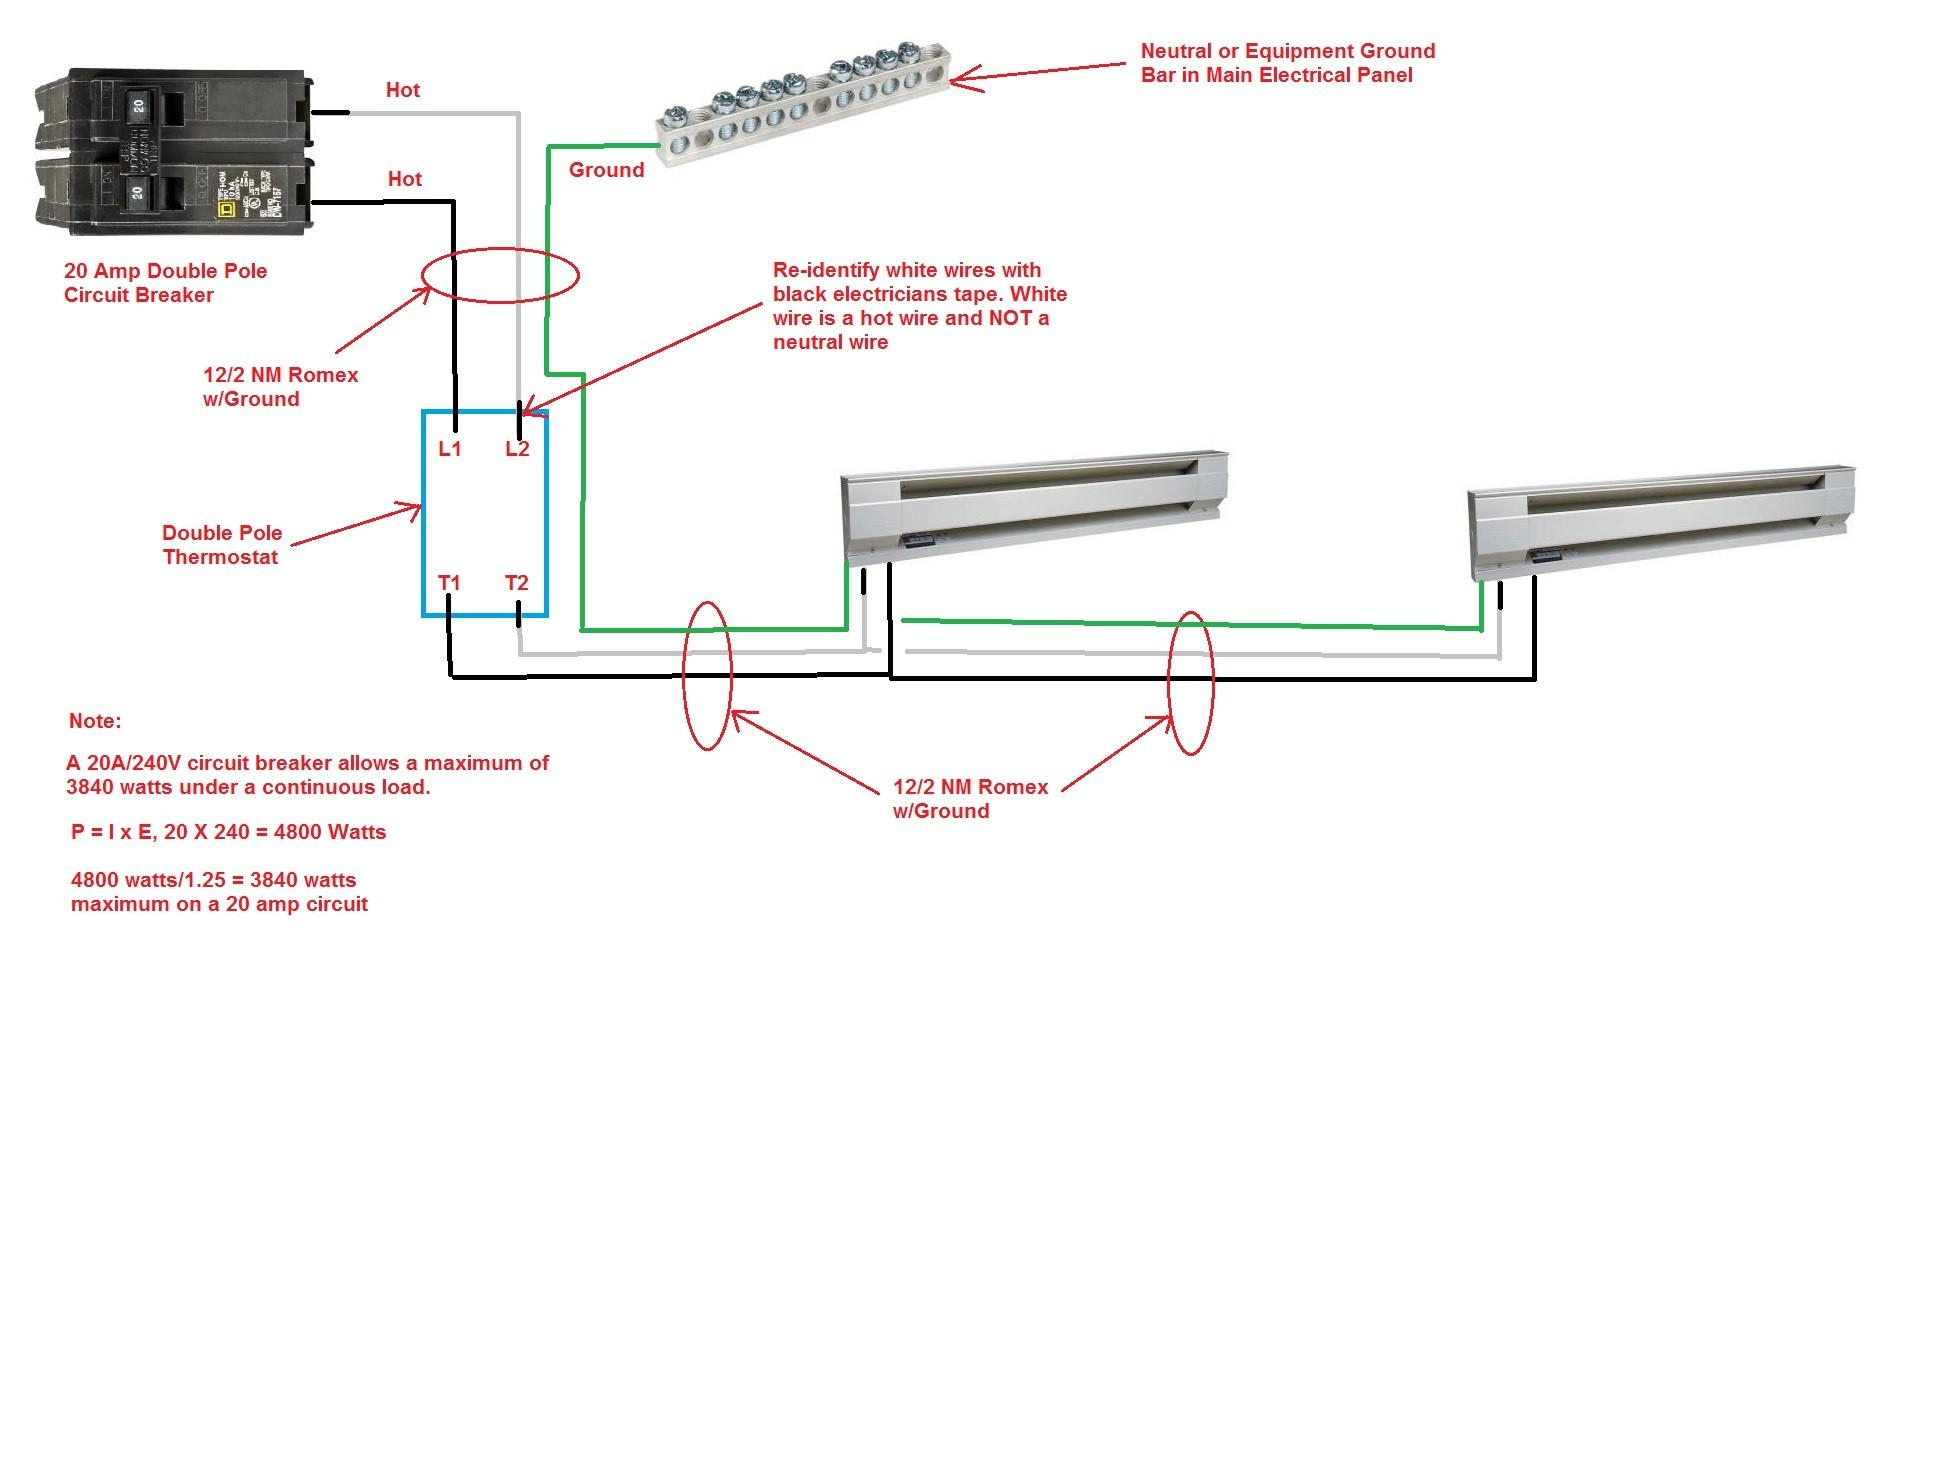 baseboard heater diagram inspirational wiring diagram image rh mainetreasurechest com Cadet Heater Wiring Diagram Electric Cove Heaters